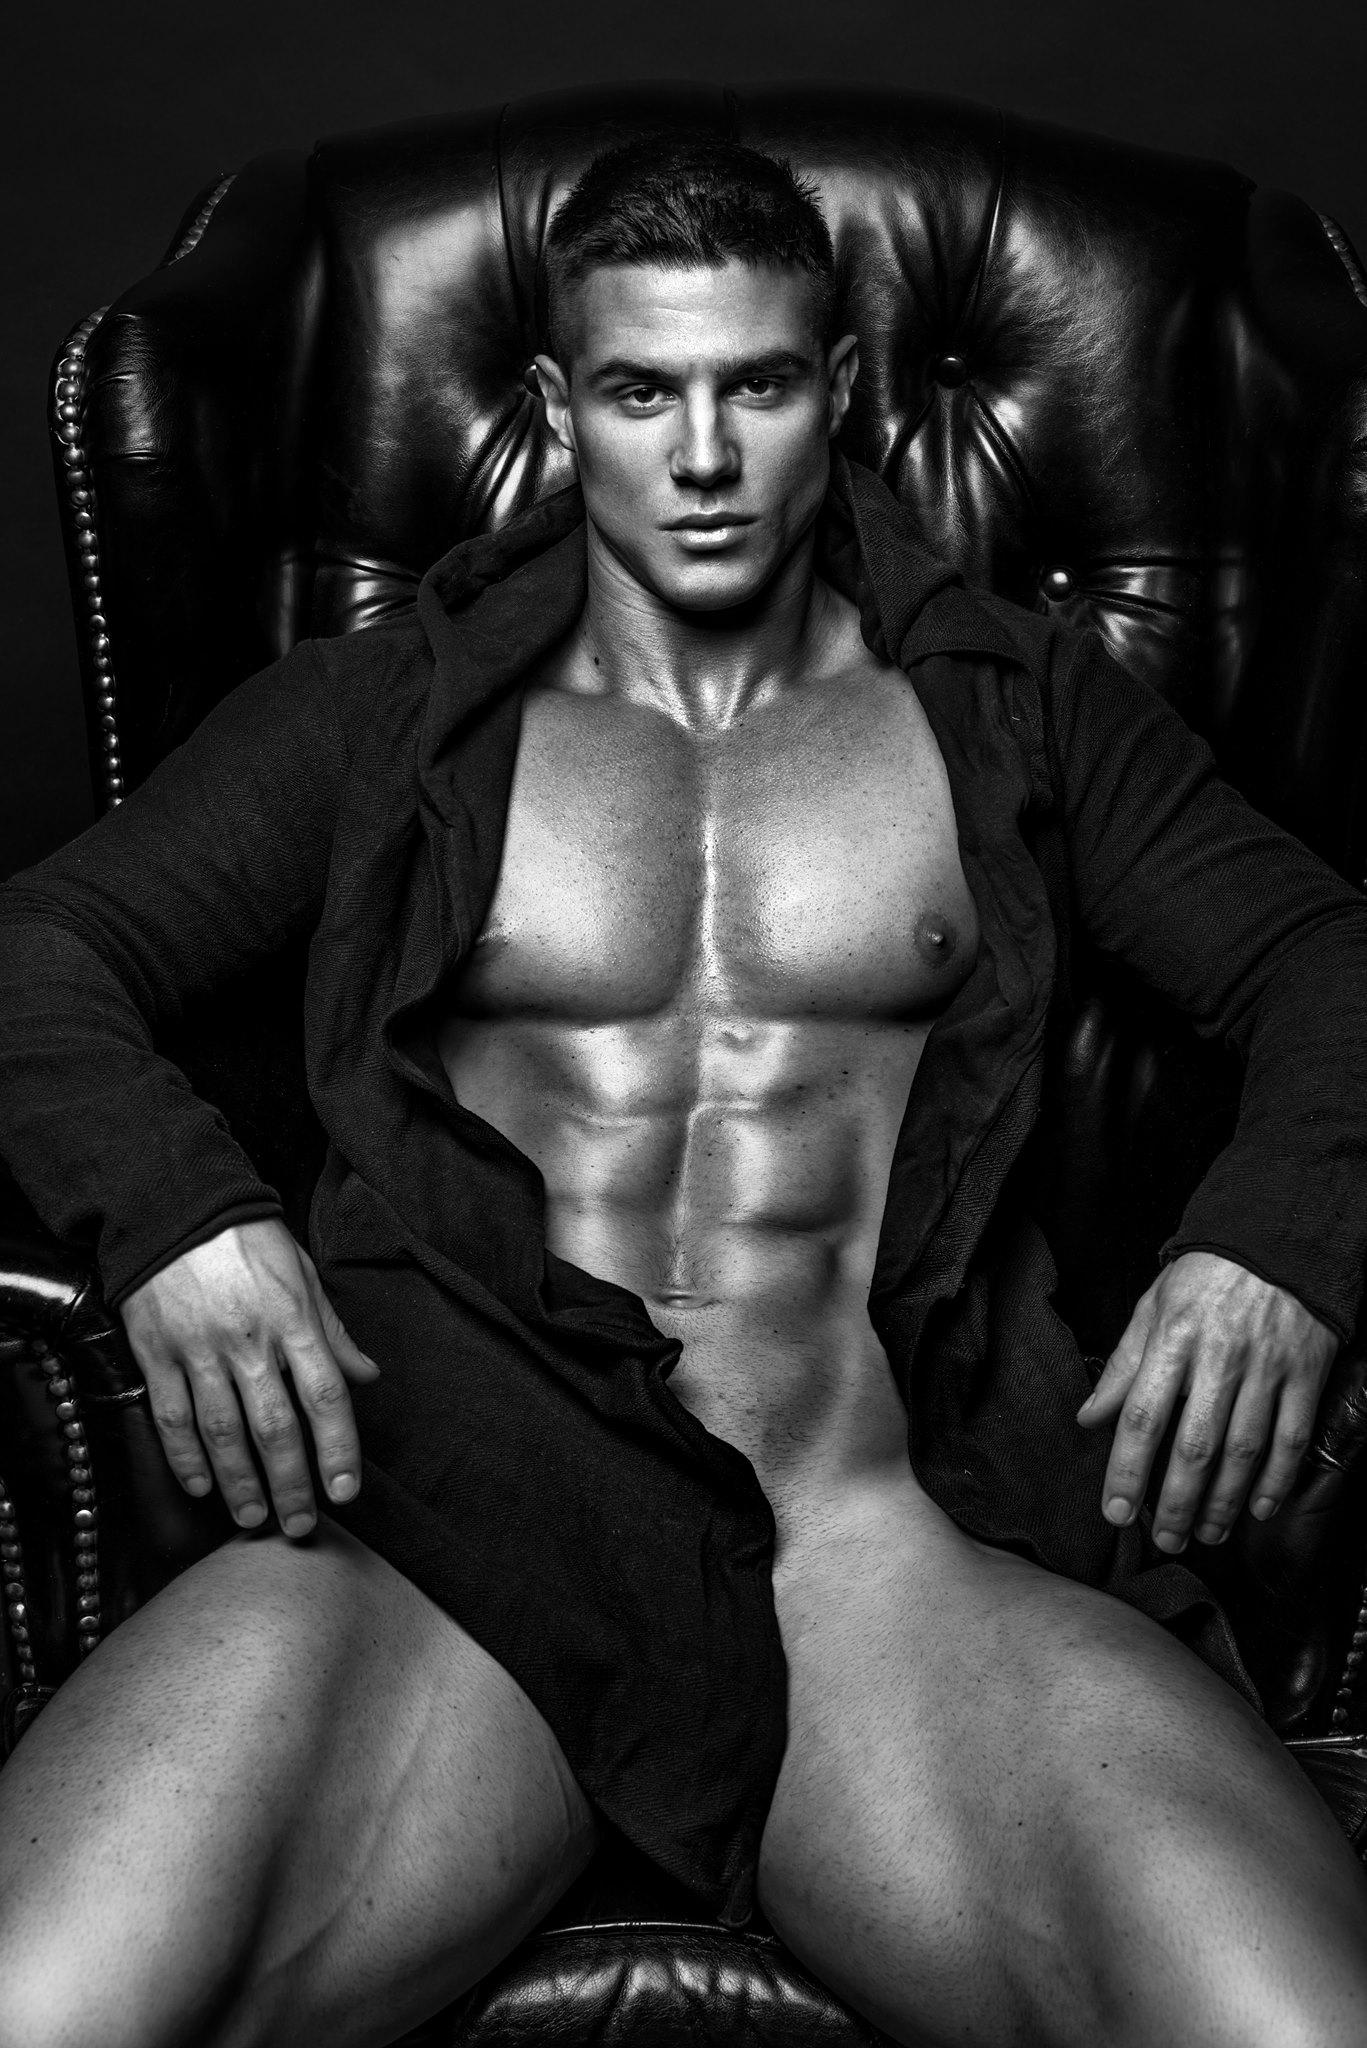 Dmitry Averyanov - The Perfect Man